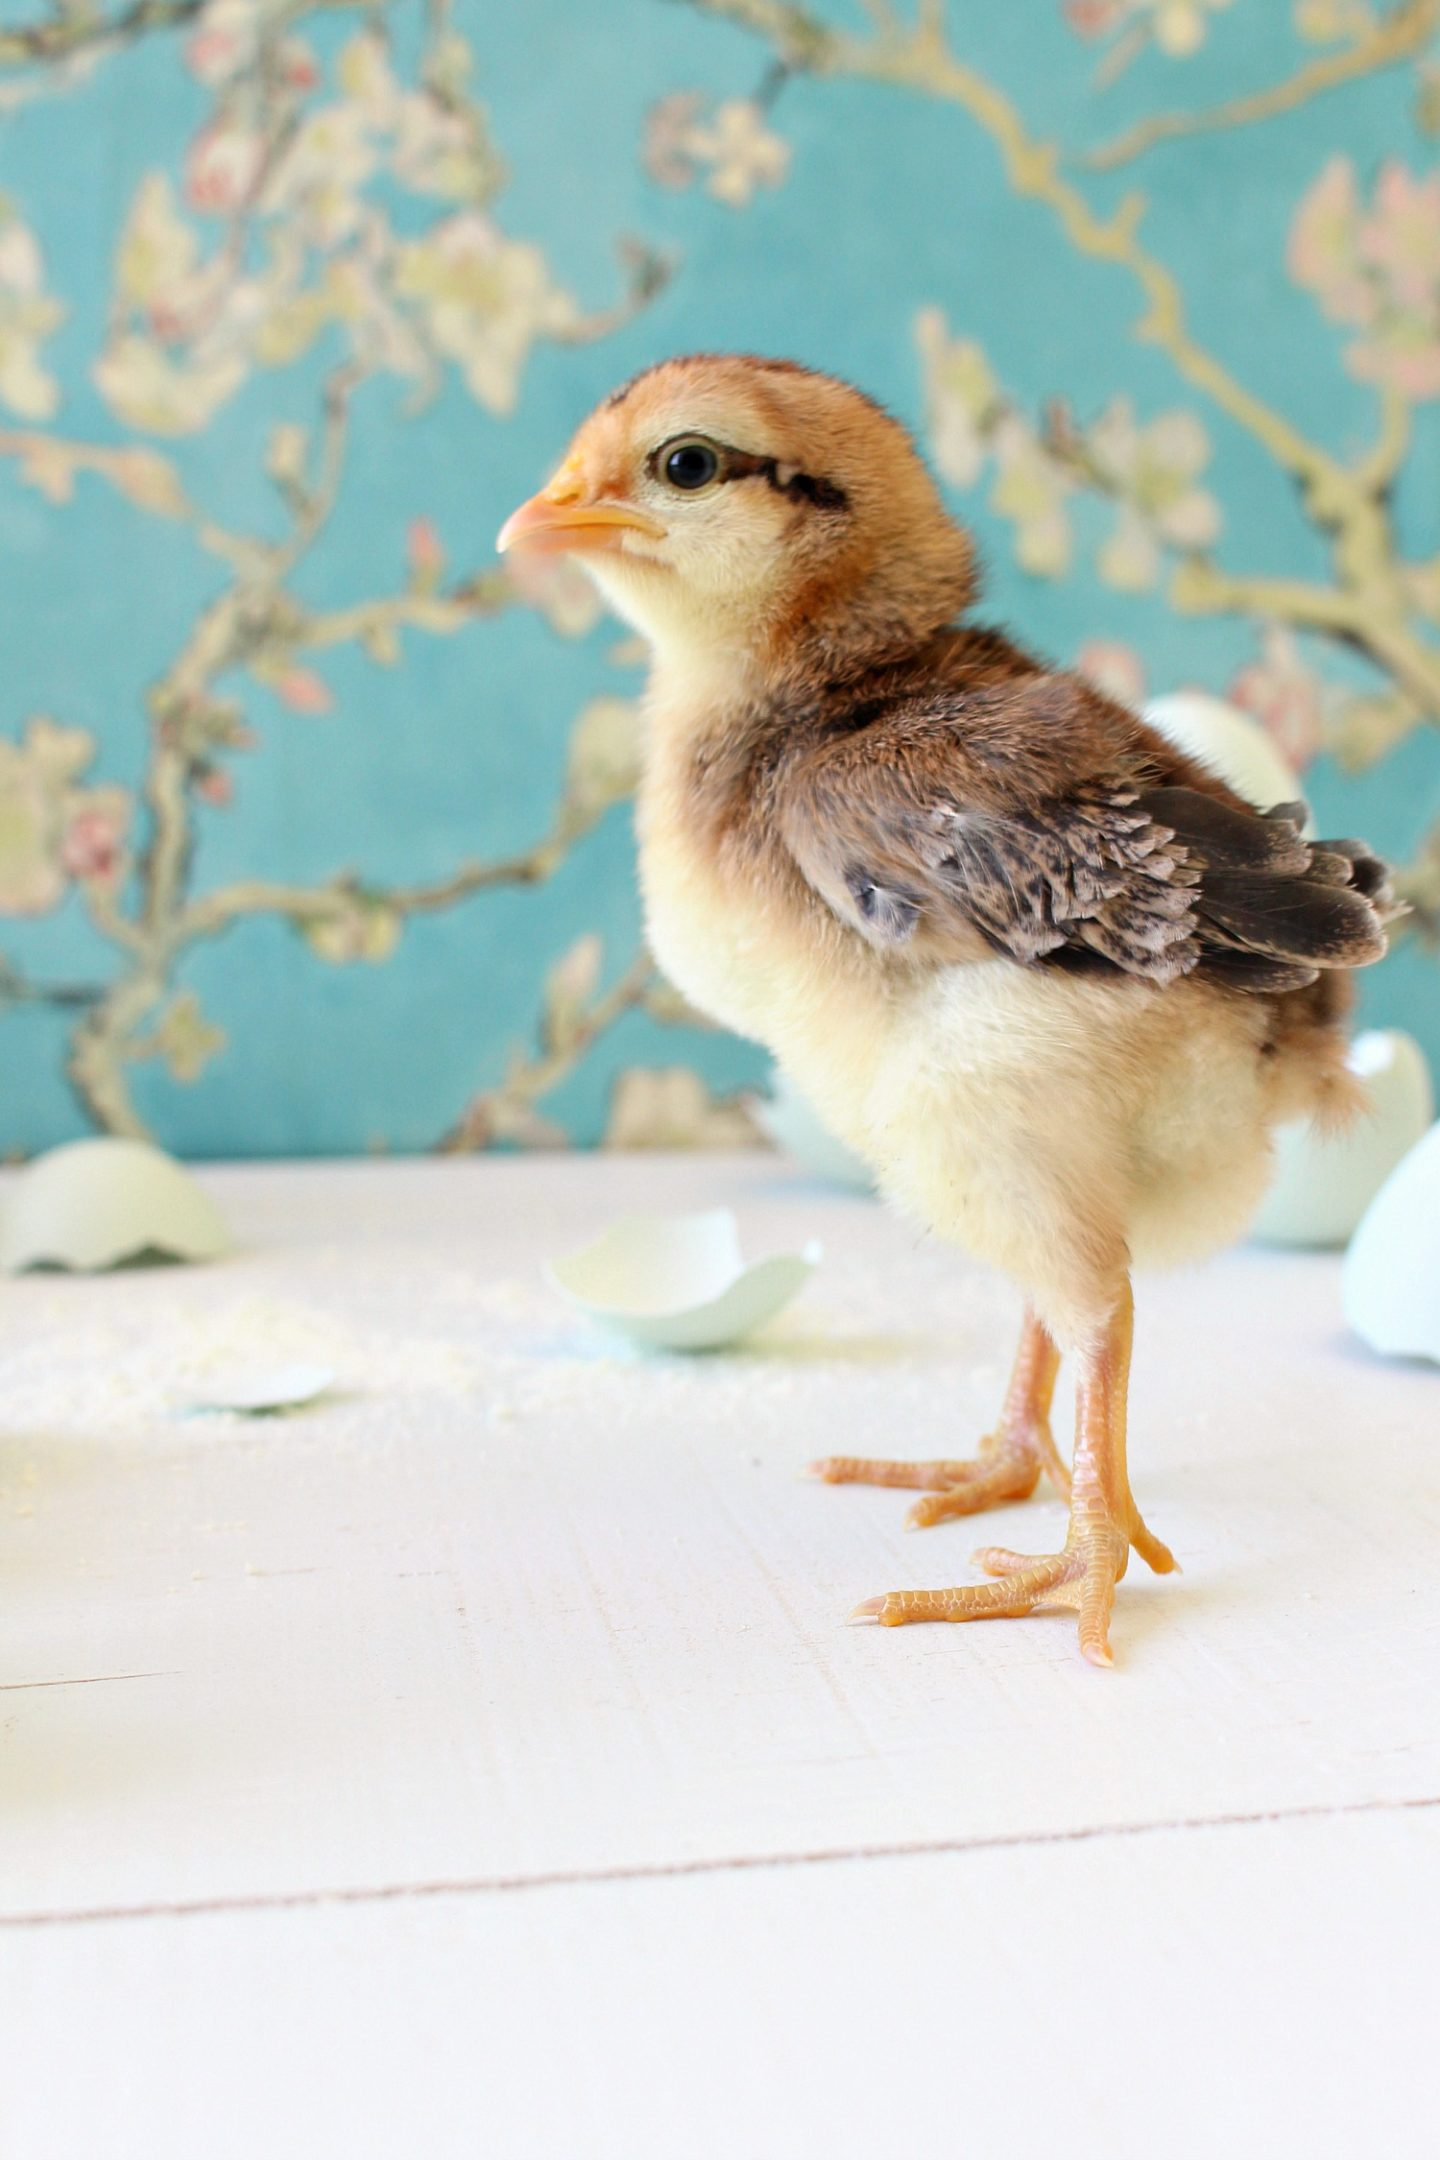 Spring Baby Chick Photos   We Got a New Batch of Chicks!